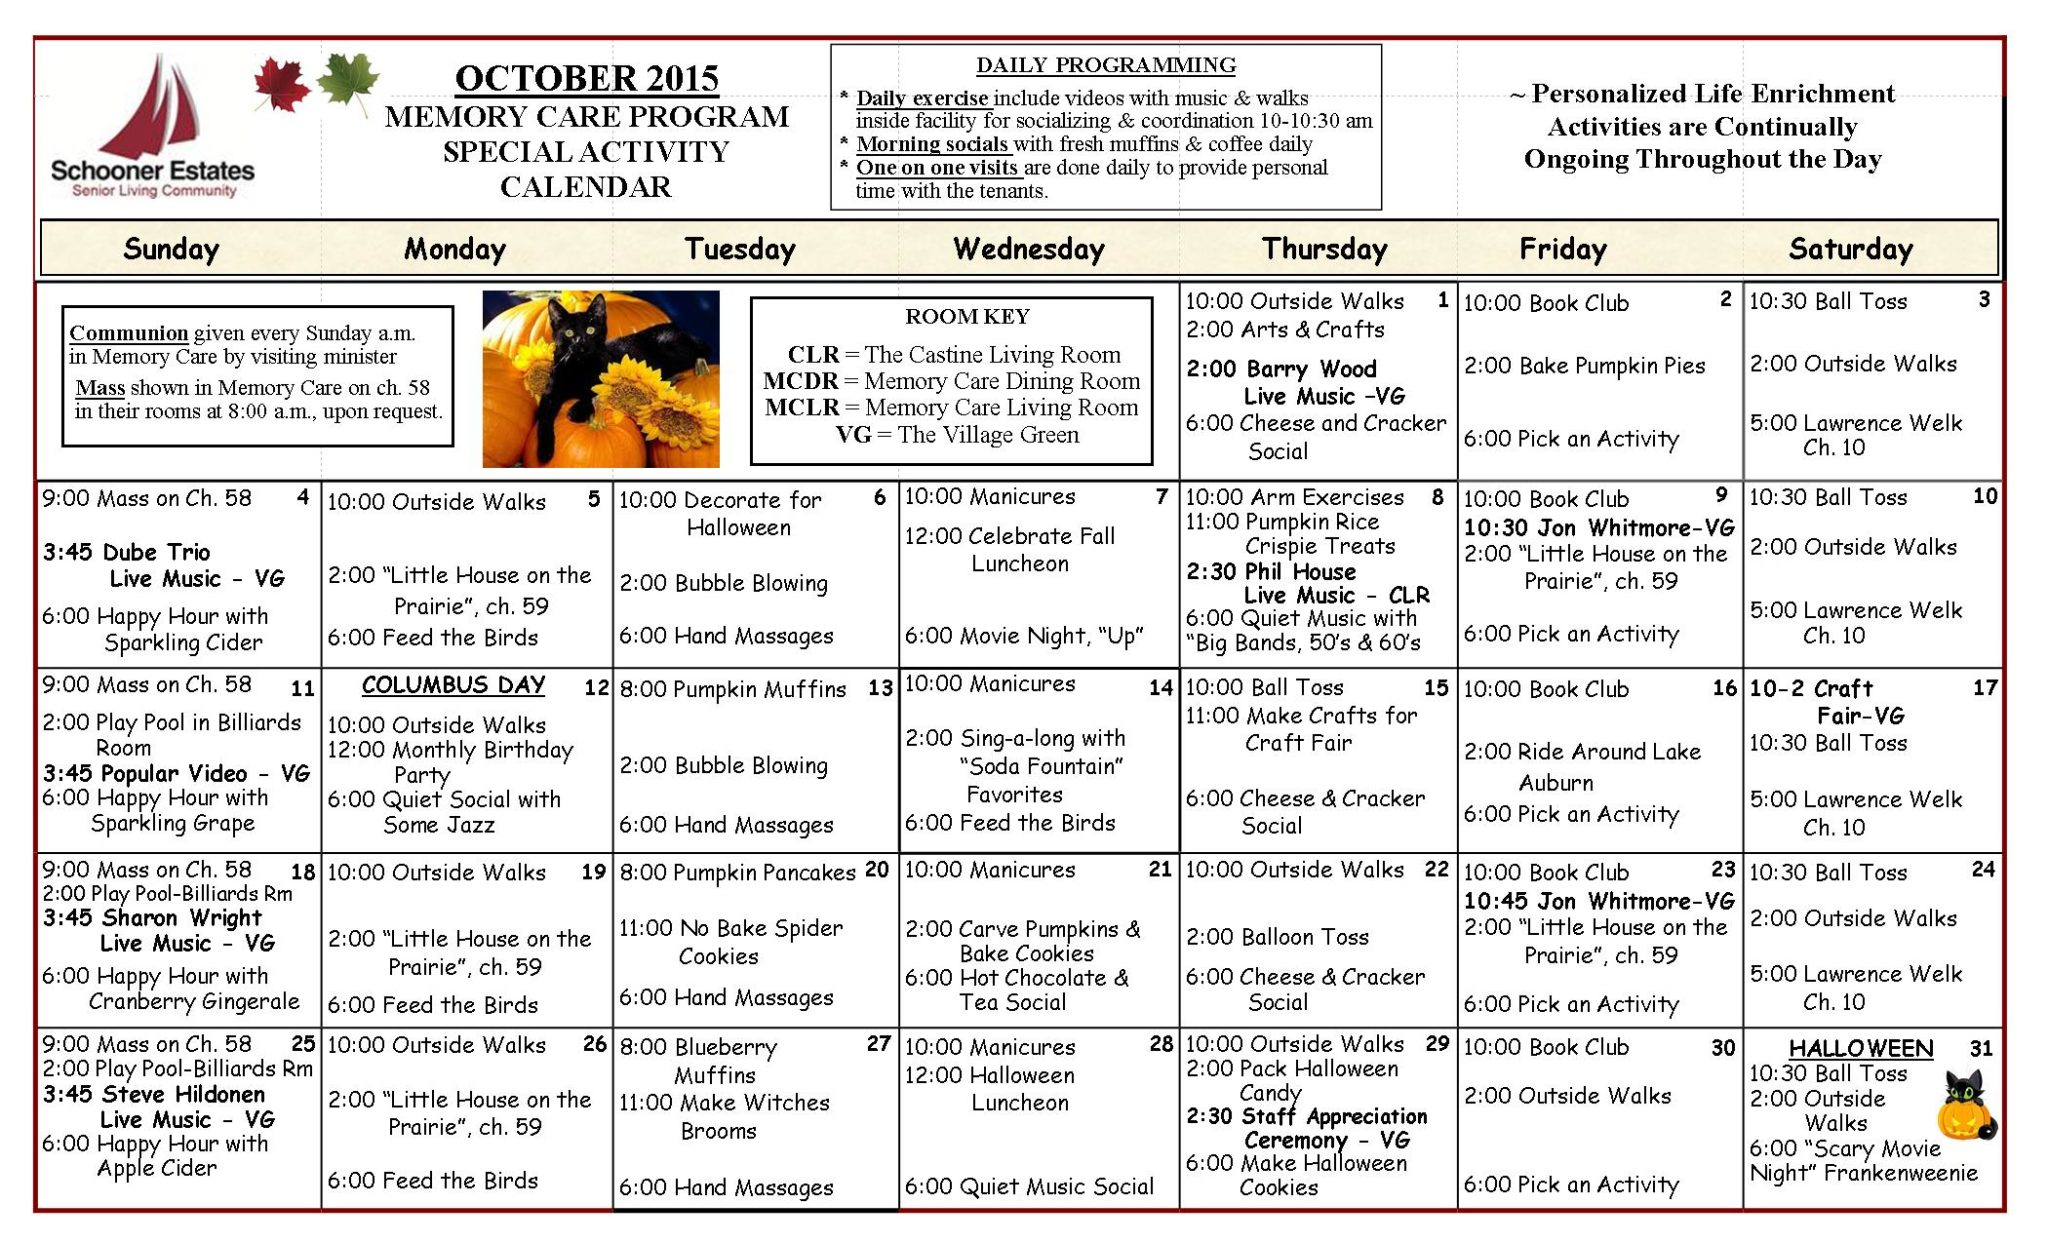 October 2015 Memory Care Activity Calendar